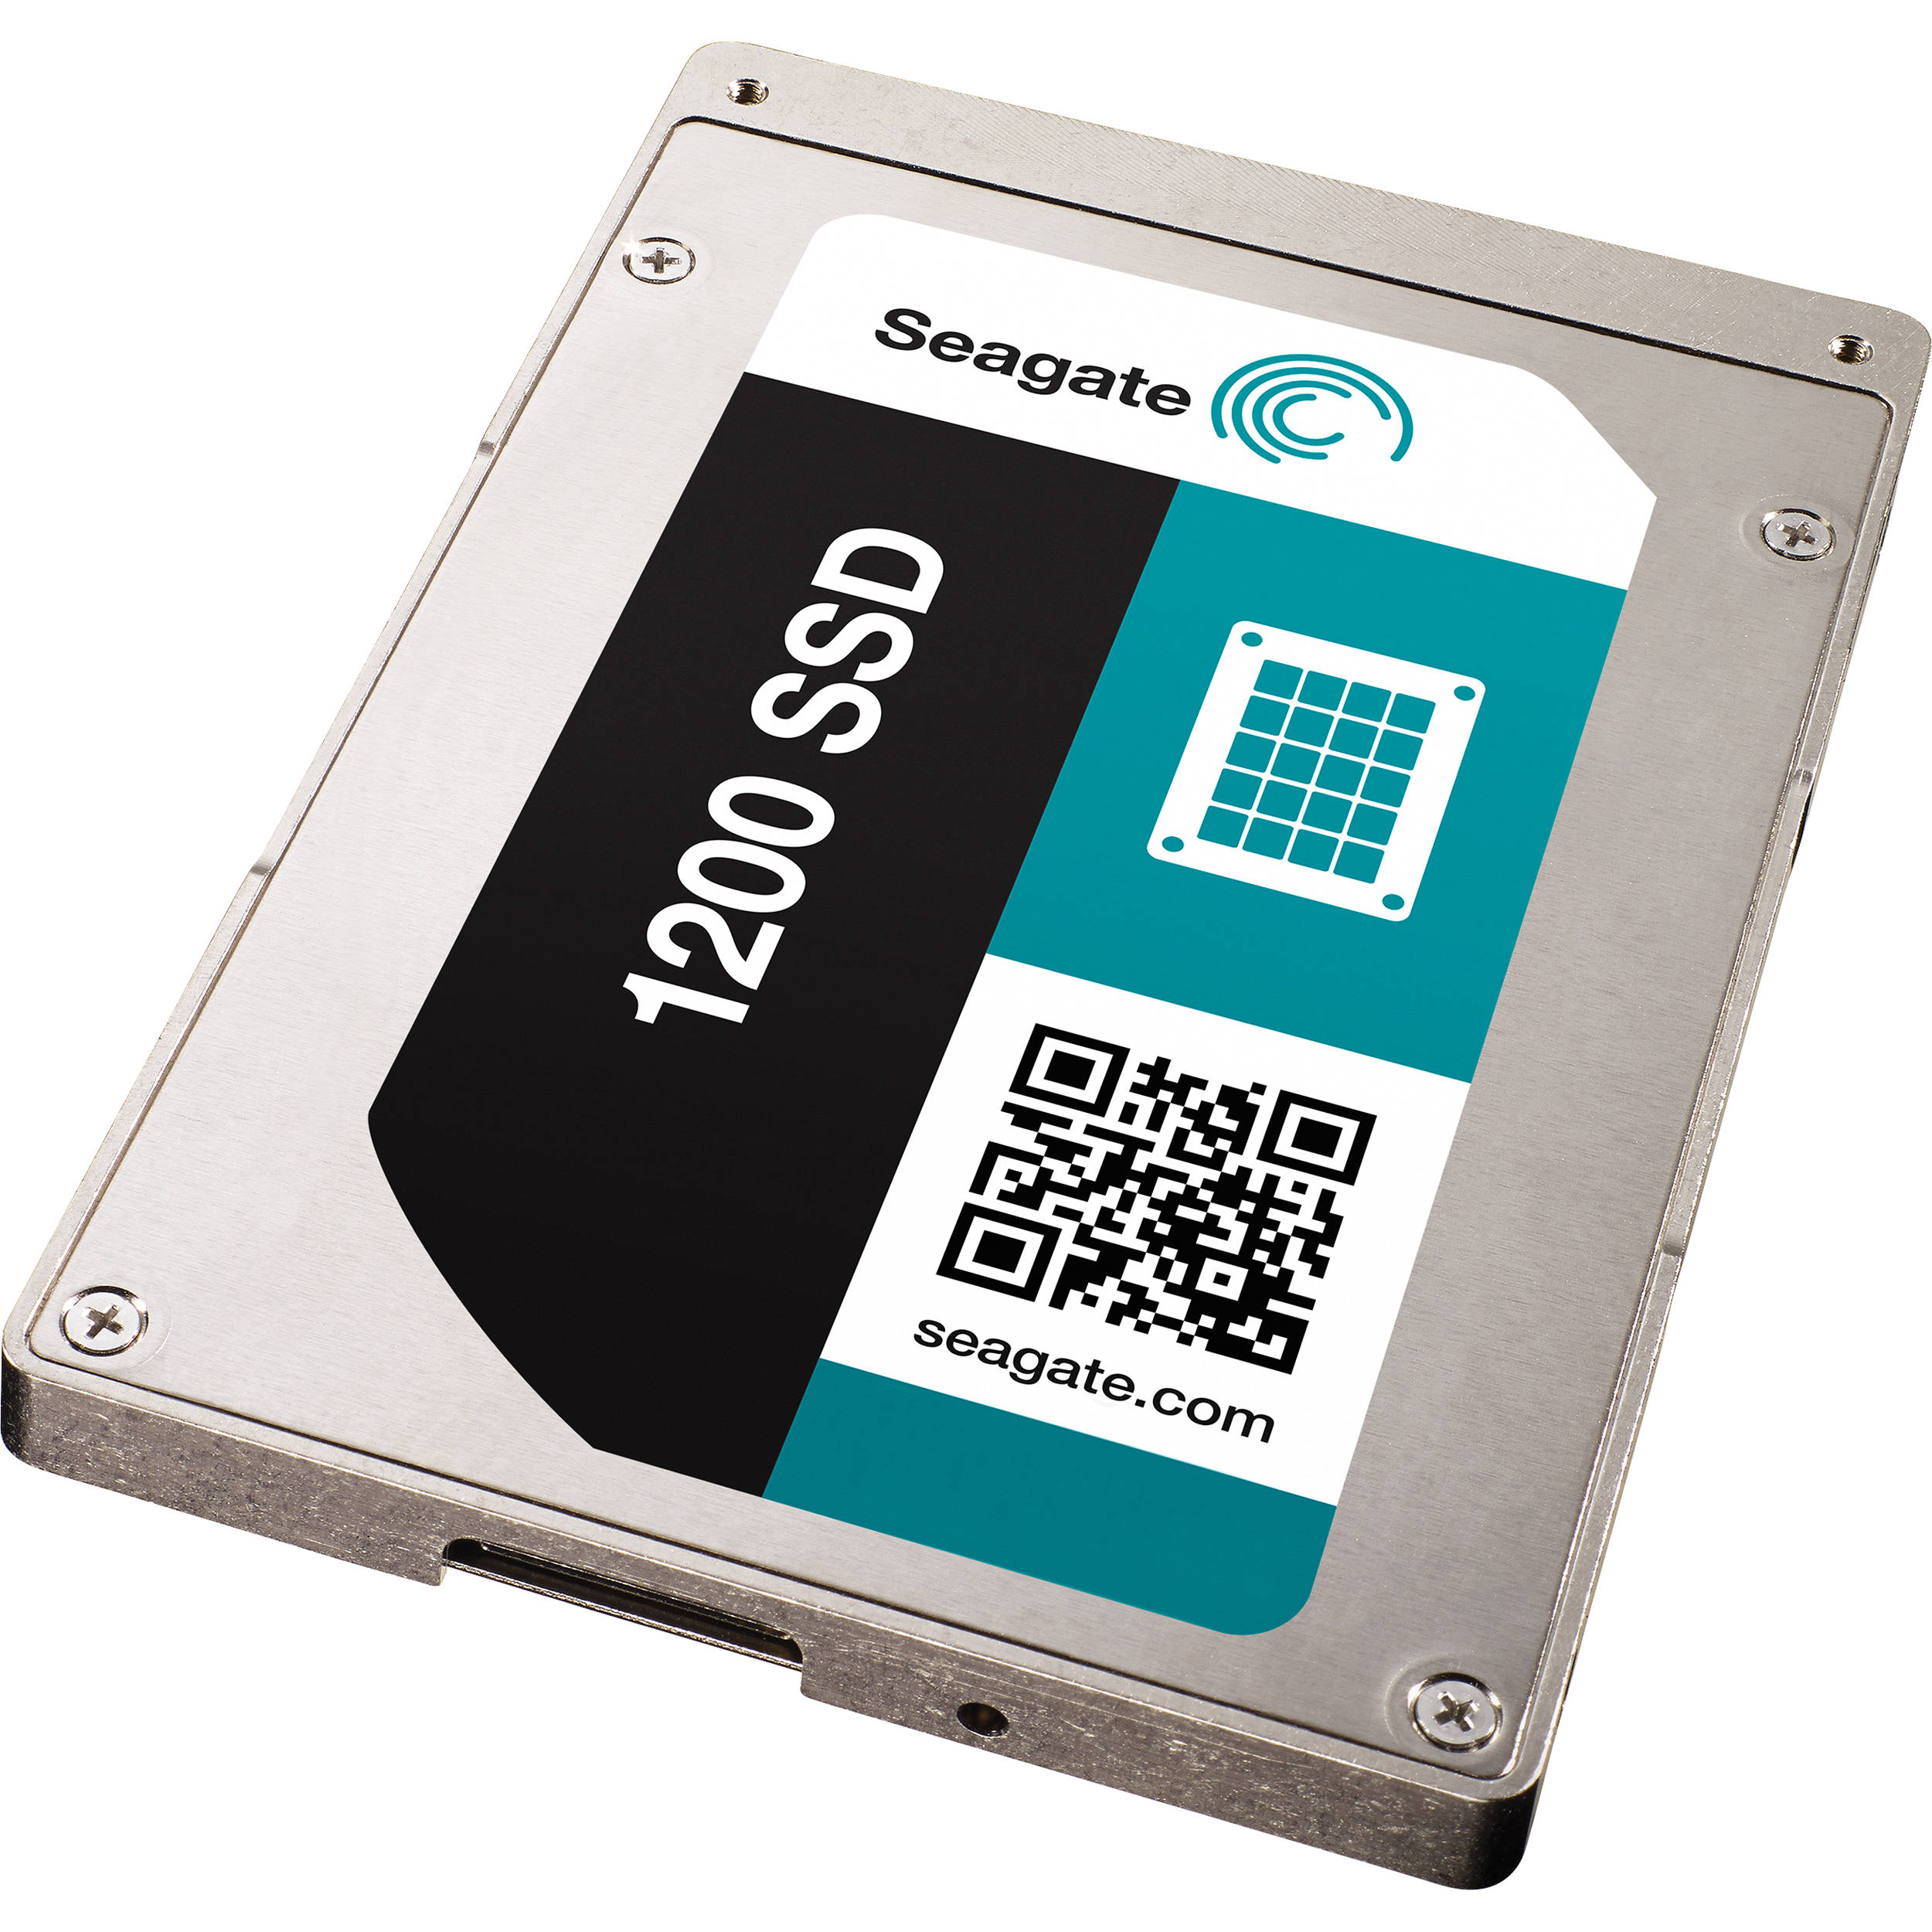 Seagate 400gb 1200 25 Sas Sed Internal Ssd St400fm0073 Sata Controller With Encryption